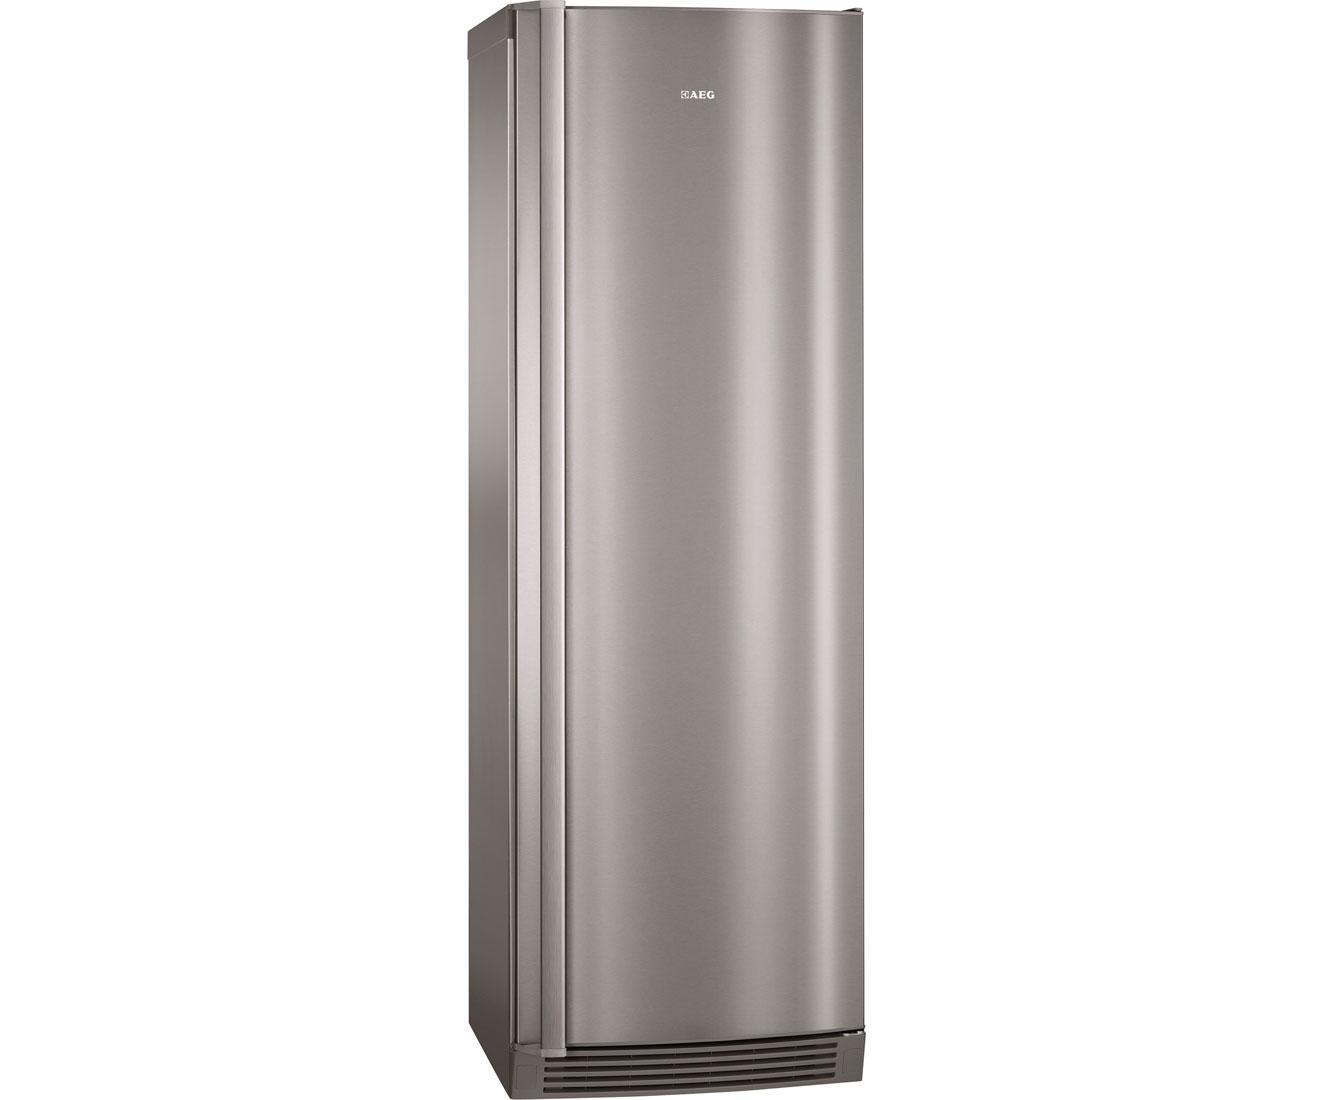 Gorenje Kühlschrank Preis : Kühlschrank kaufen gorenje kühlschrank gorenje bewertung louie l